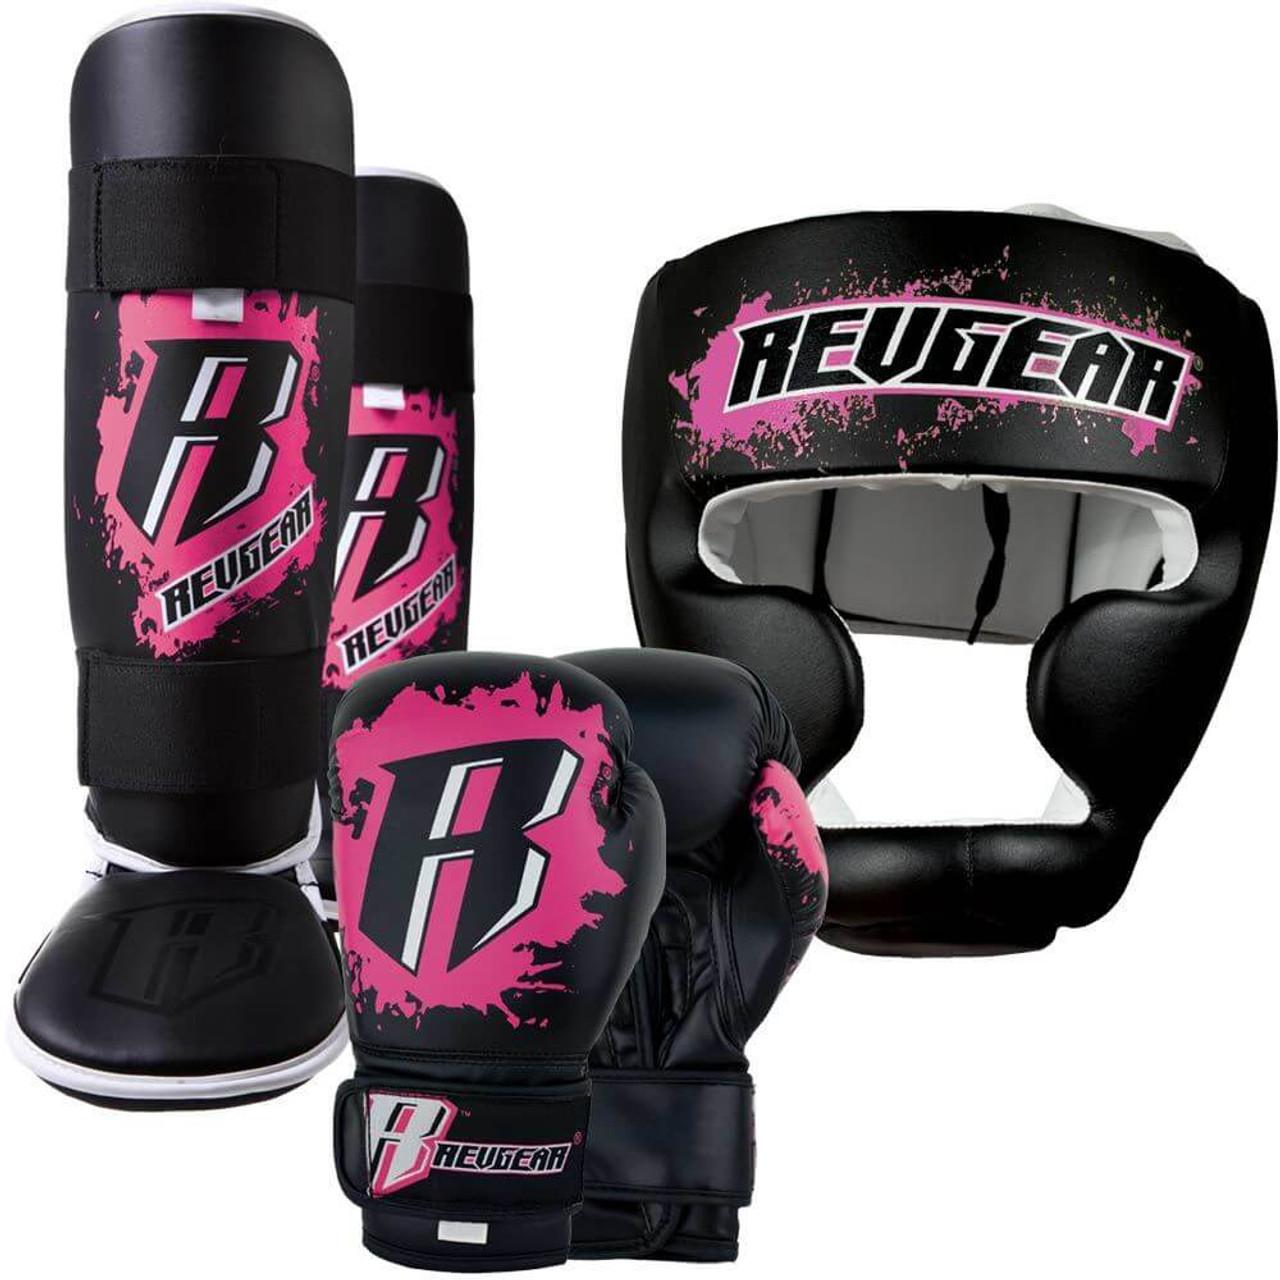 Kids Deluxe Kickboxing Kit - Pink